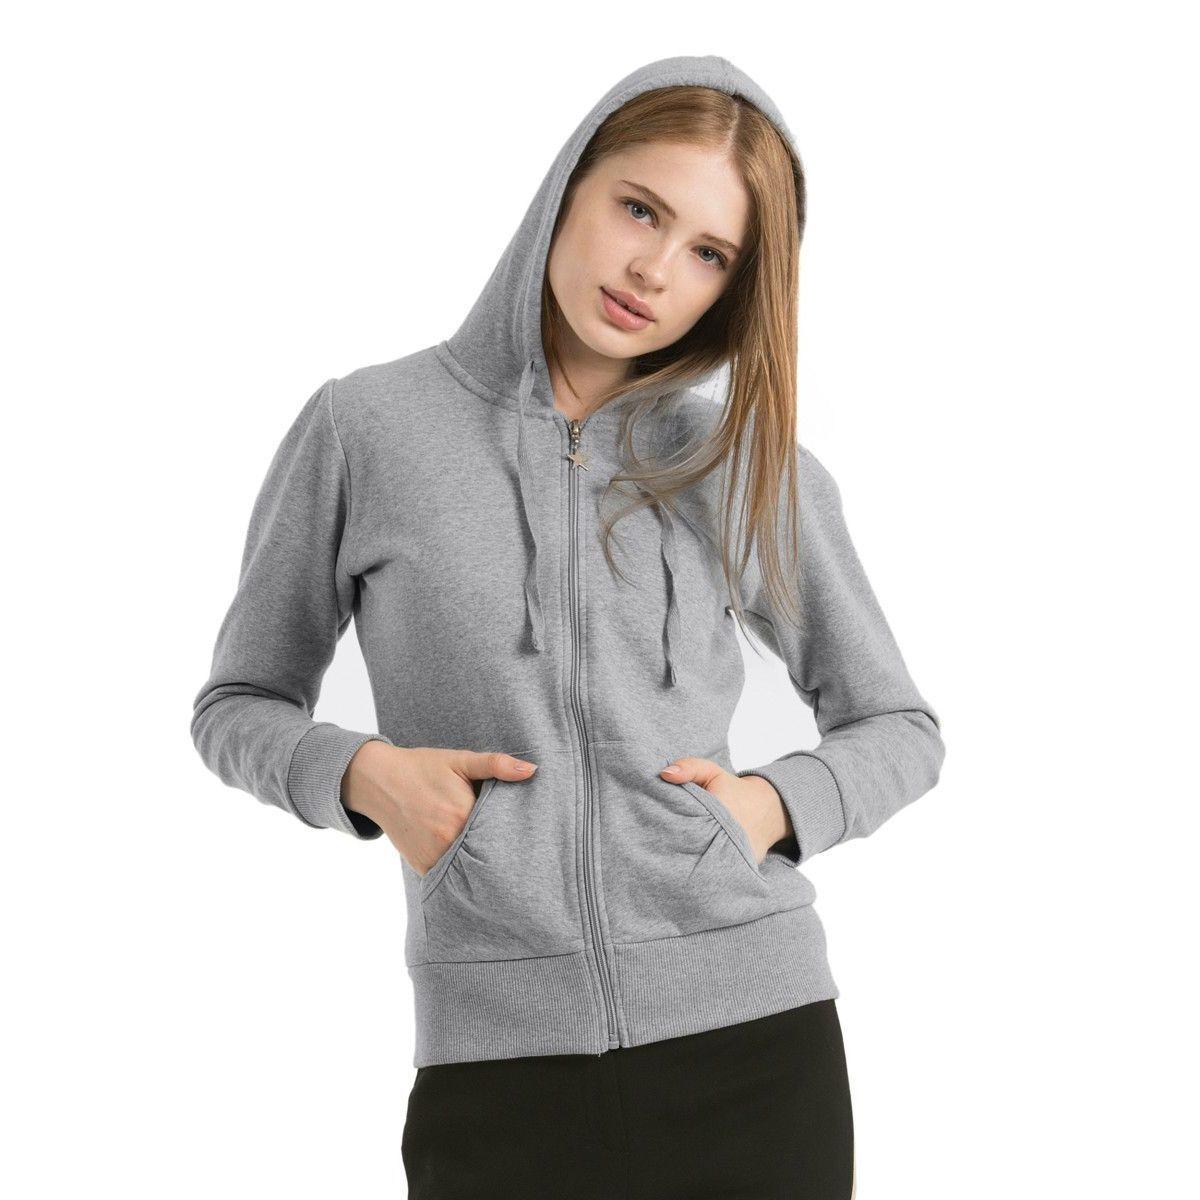 B&C Wonder Women Hooded Sweatshirt